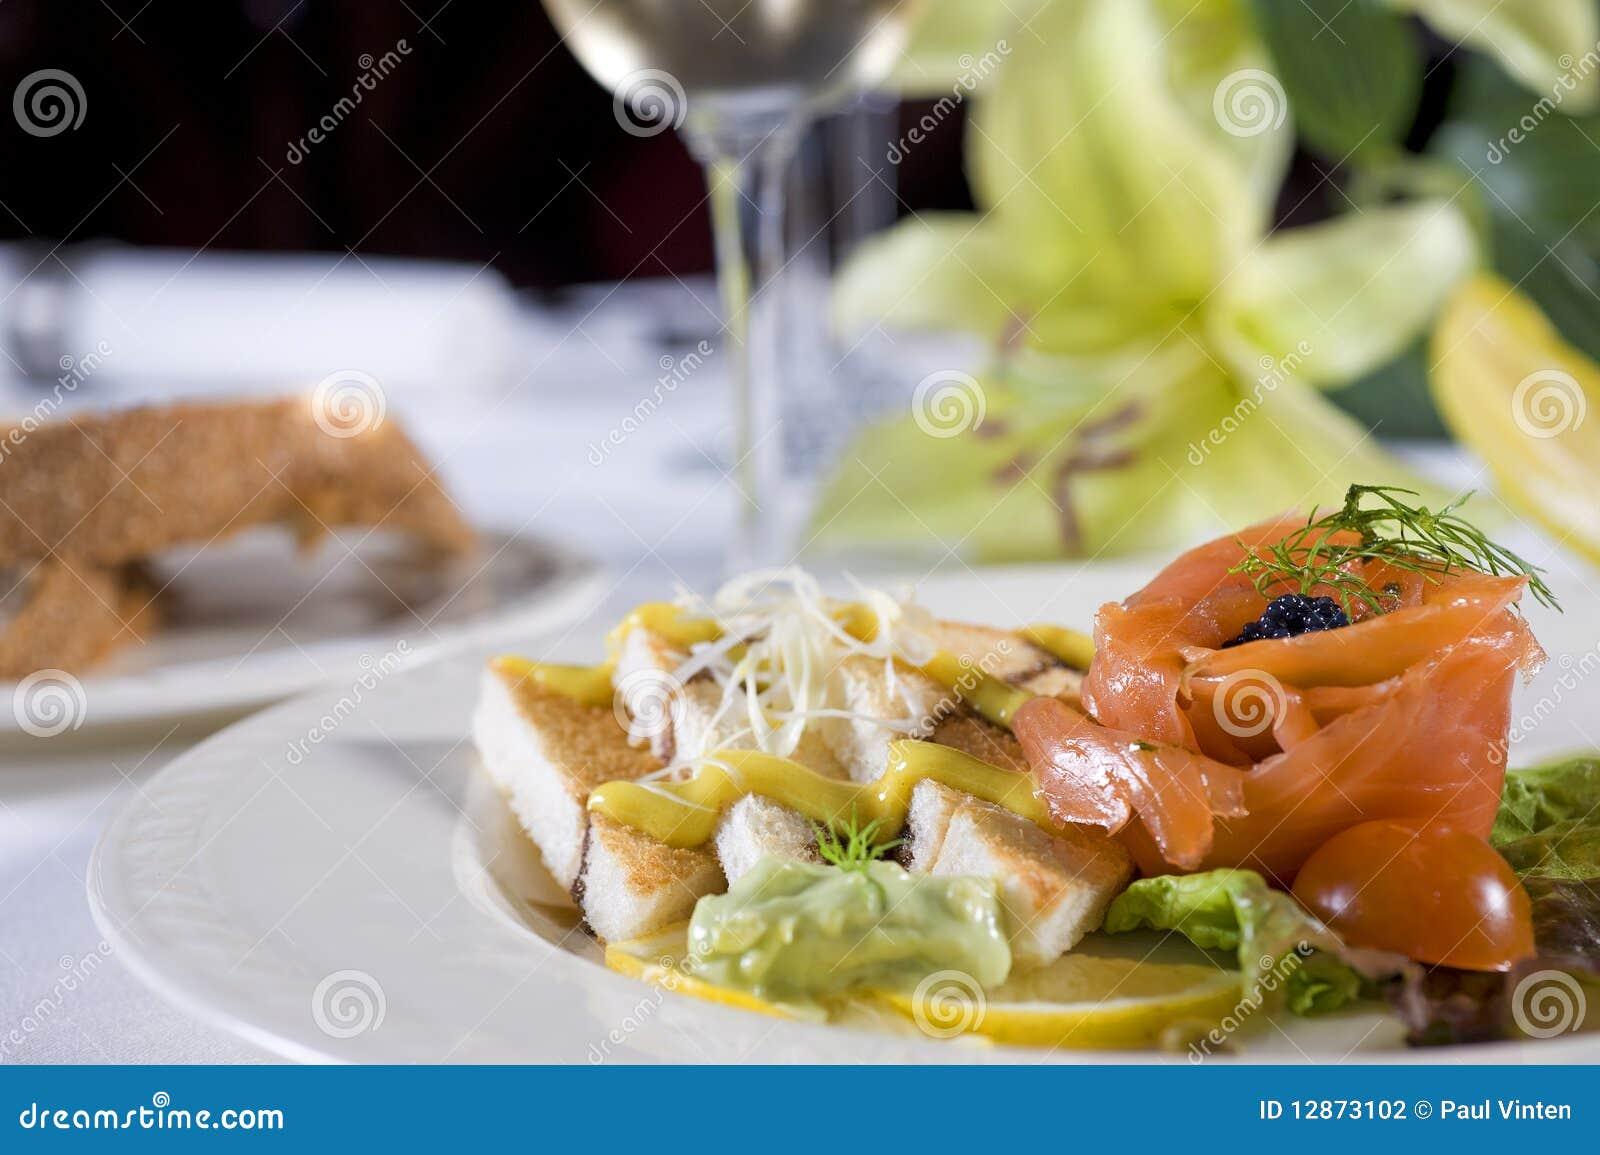 Smoked salmon on toast a la carte appetizer